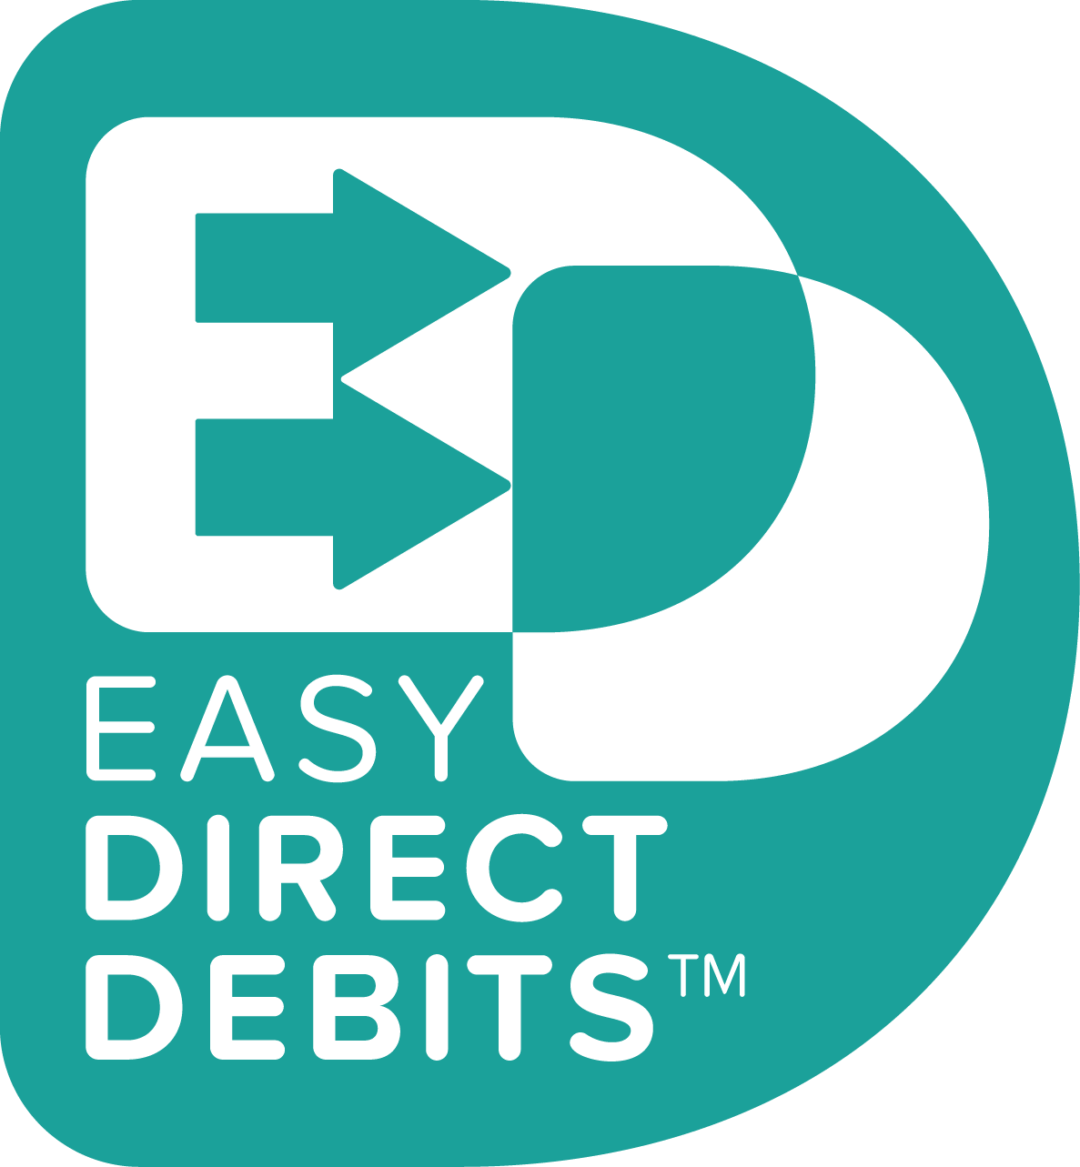 Direct debit marketing designed for financial services client